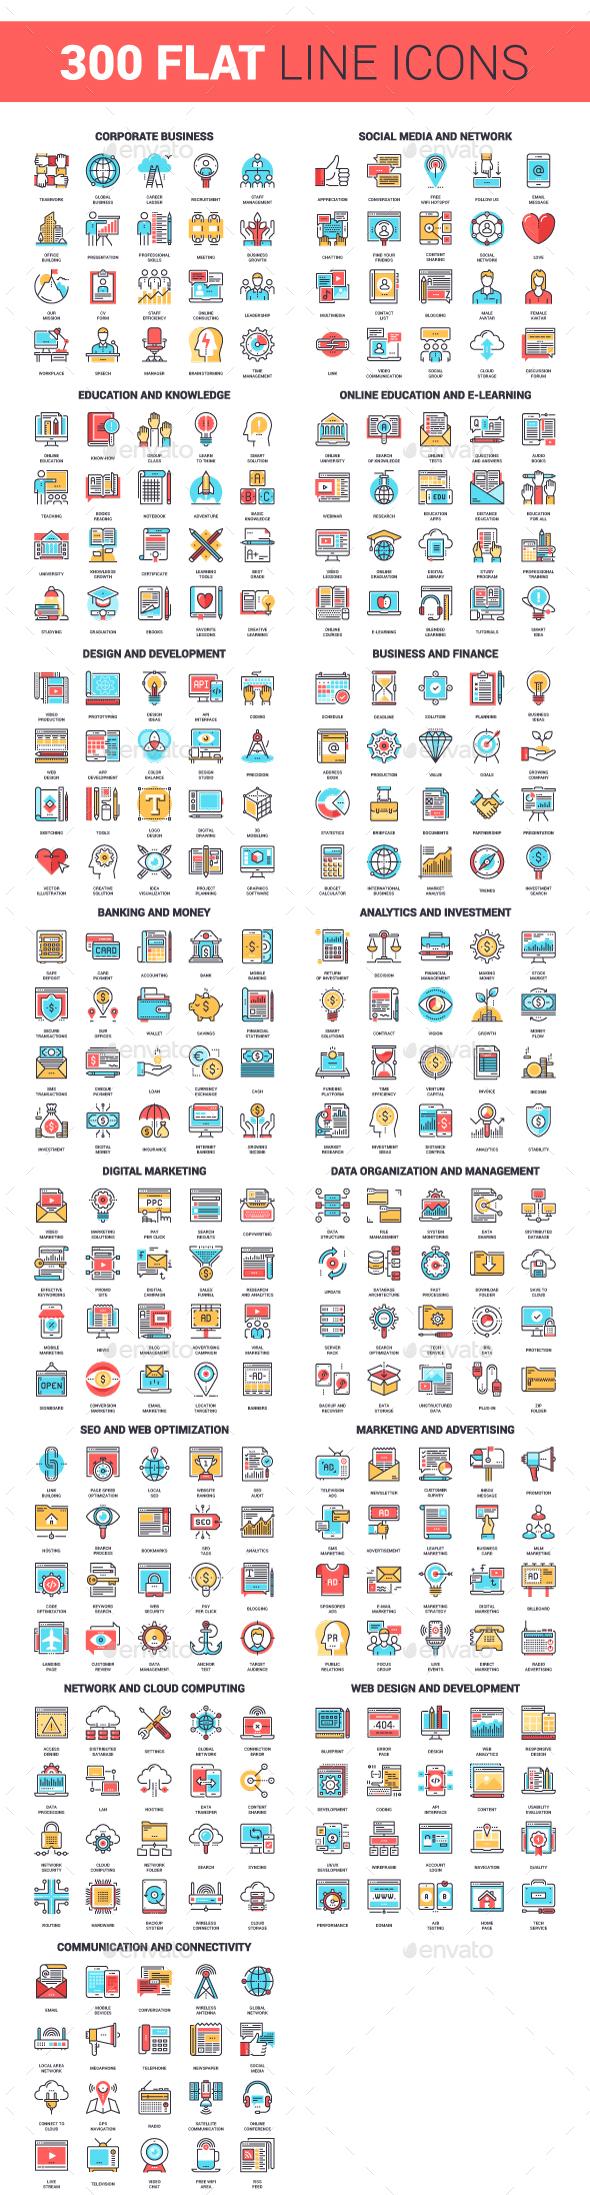 300 Flat Line Icons Bundle - Icons